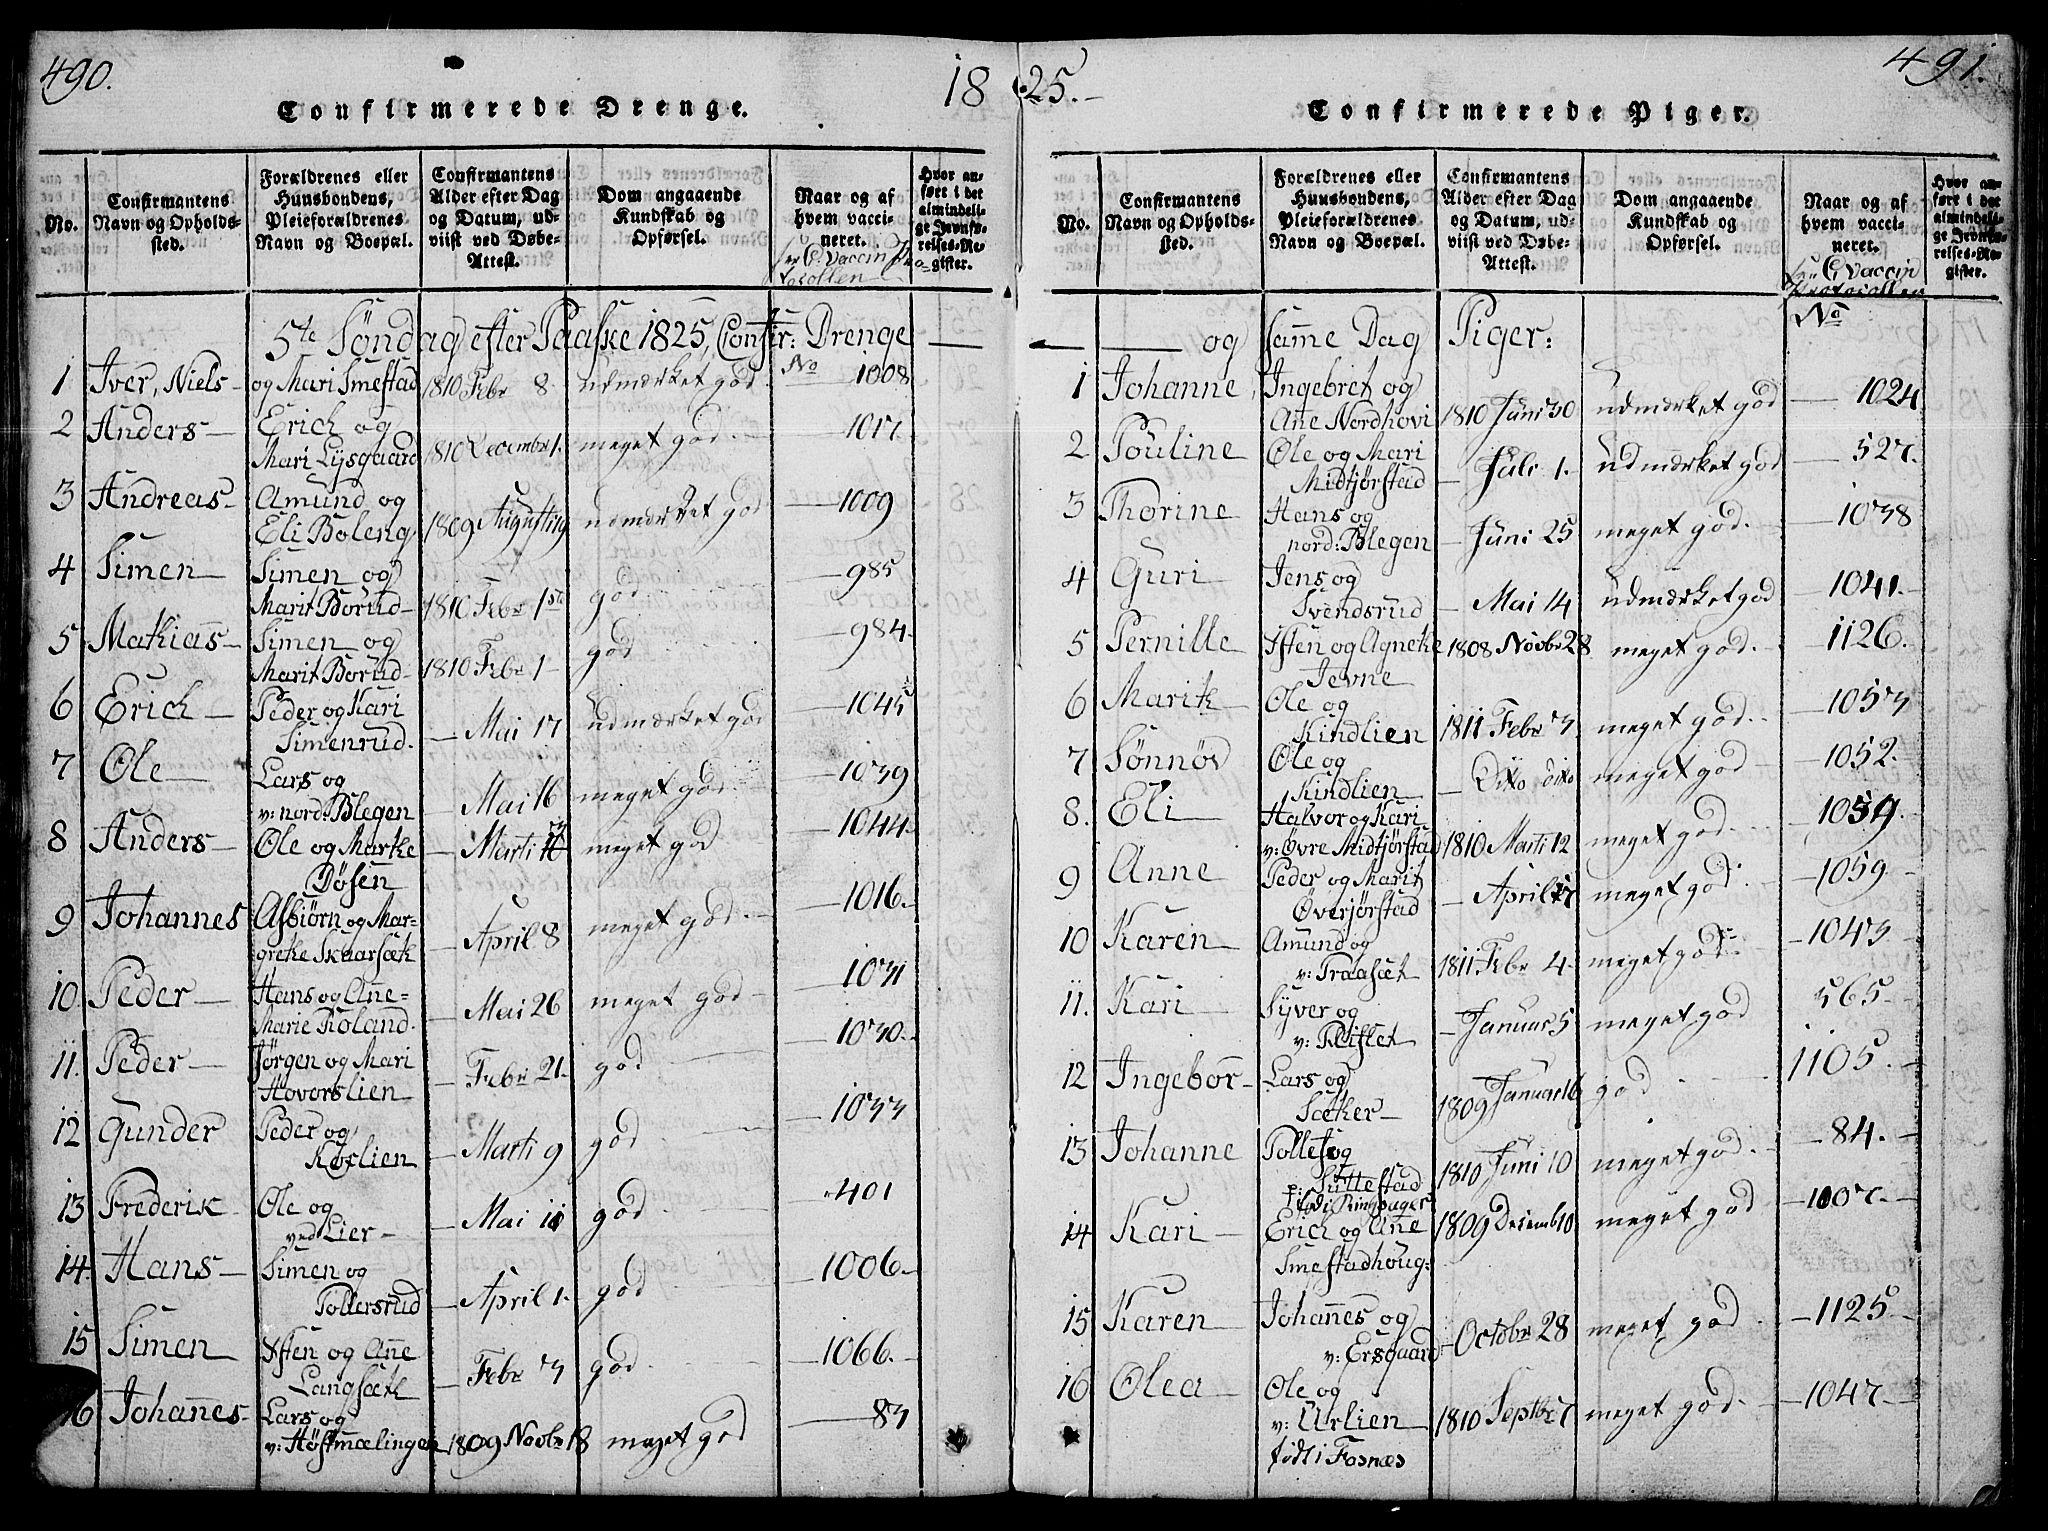 SAH, Fåberg prestekontor, Klokkerbok nr. 4, 1818-1837, s. 490-491